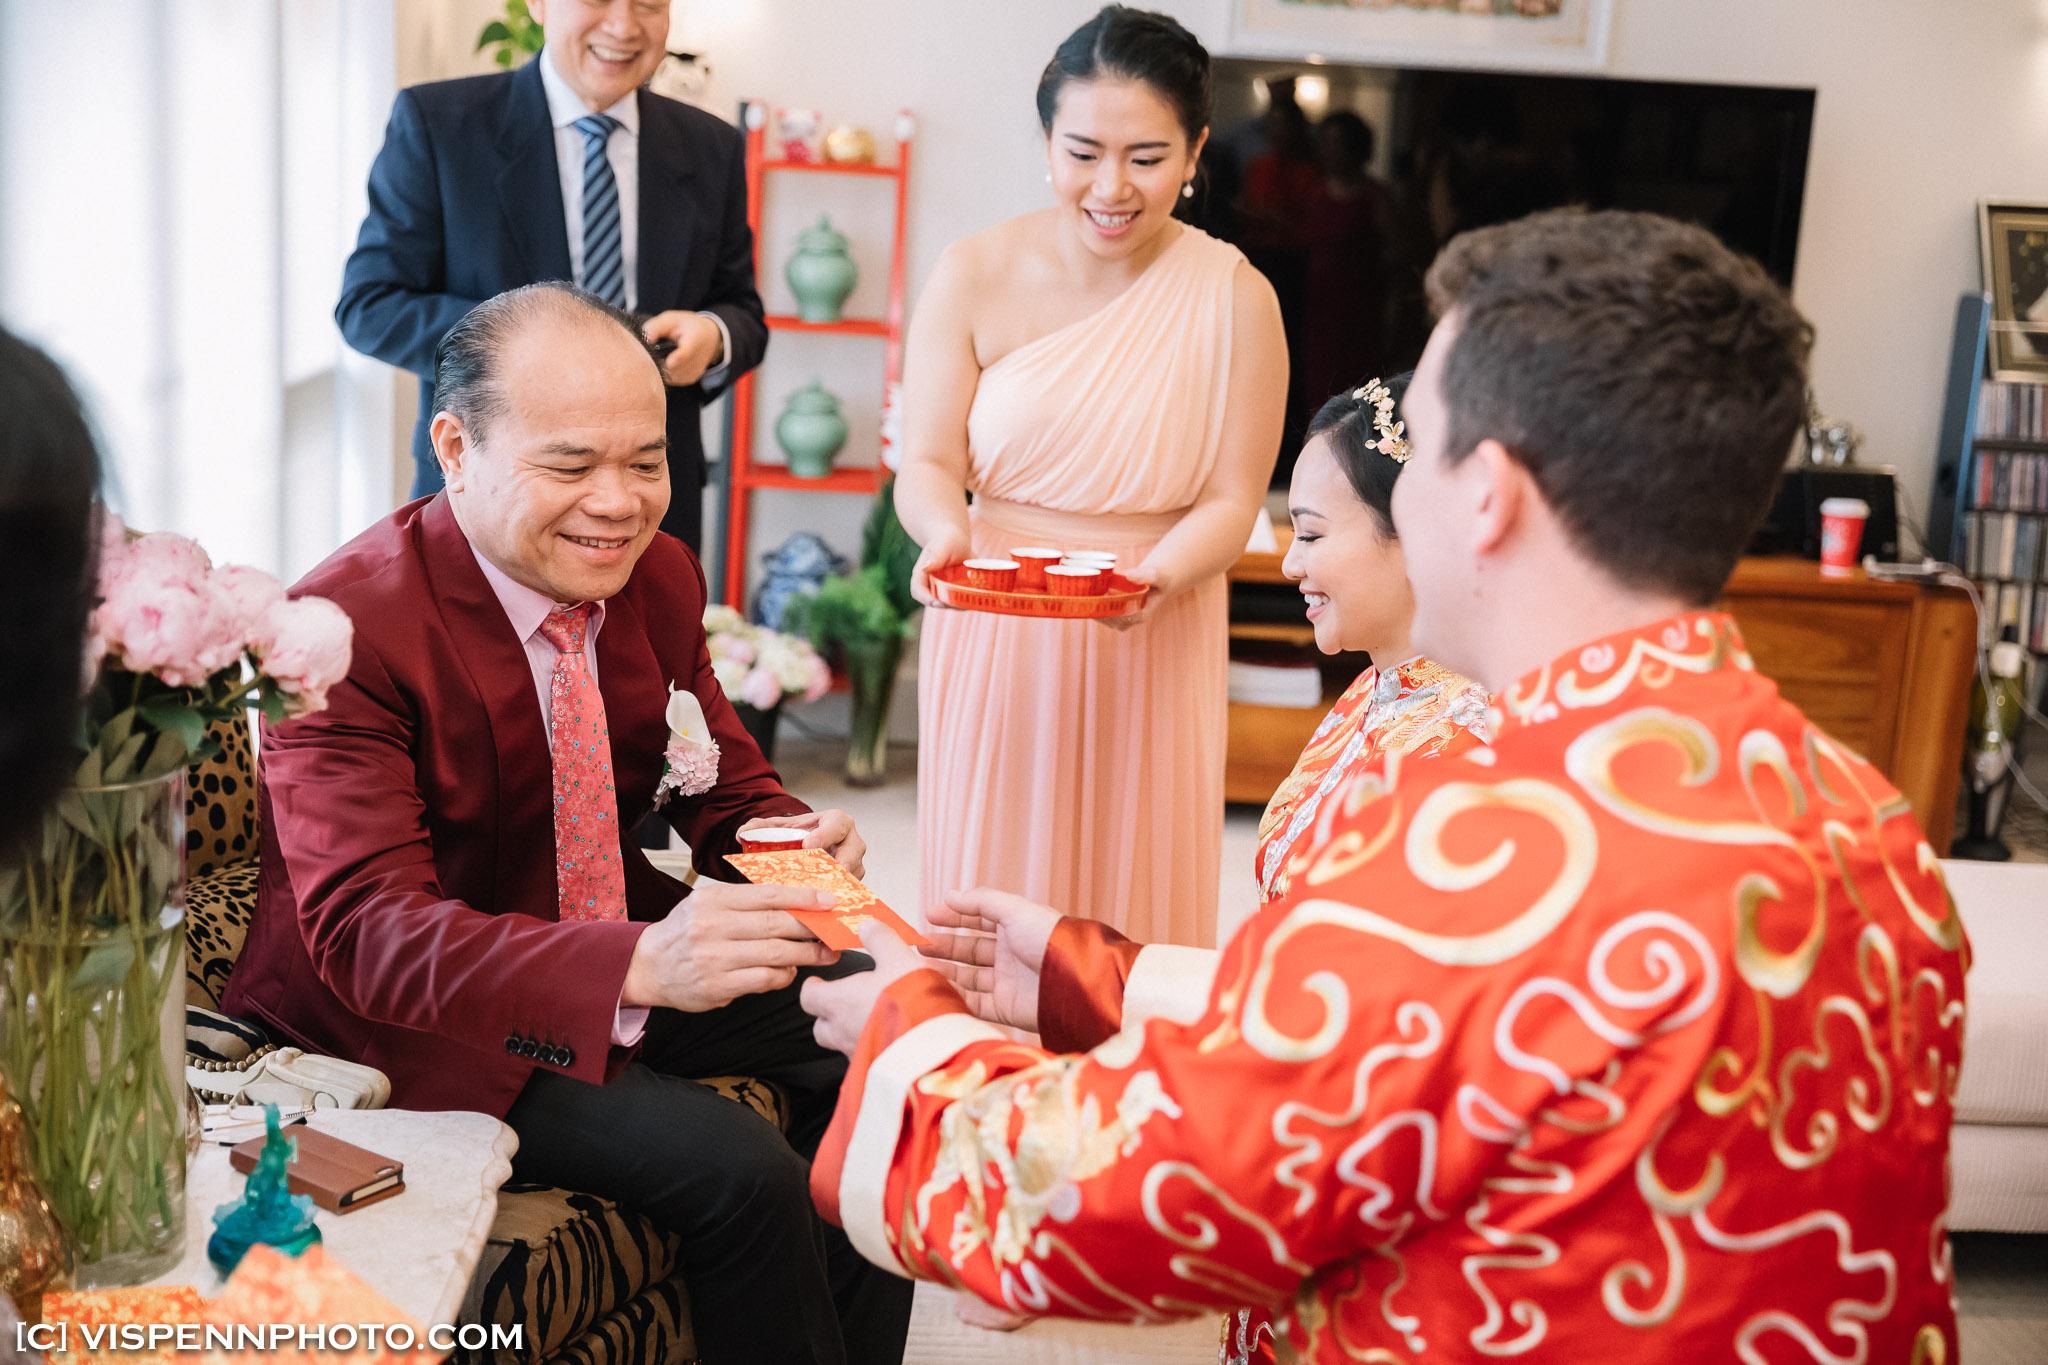 WEDDING DAY Photography Melbourne VISPENN 墨尔本 婚礼跟拍 婚礼摄像 婚礼摄影 结婚照 登记照 VISPENN Kat P1 01442